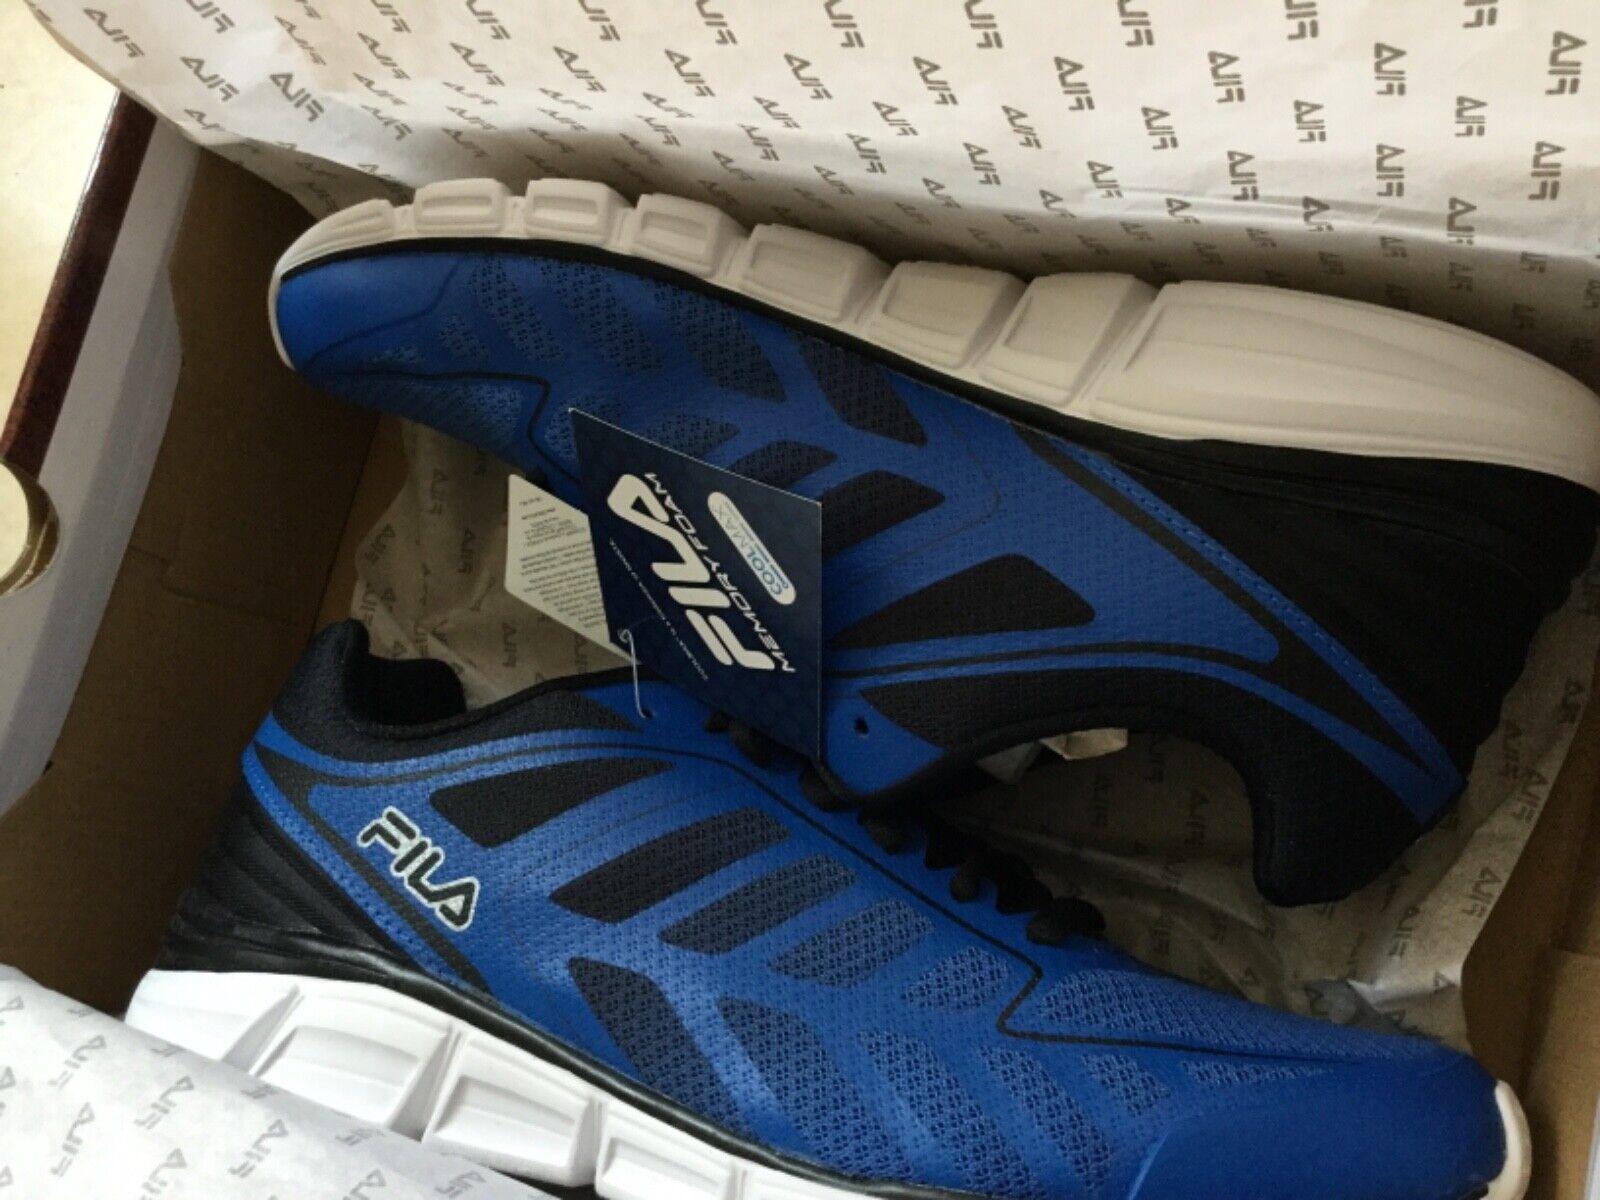 Homme Fila Memory Finity 2 Chaussures De Course 10.5 m